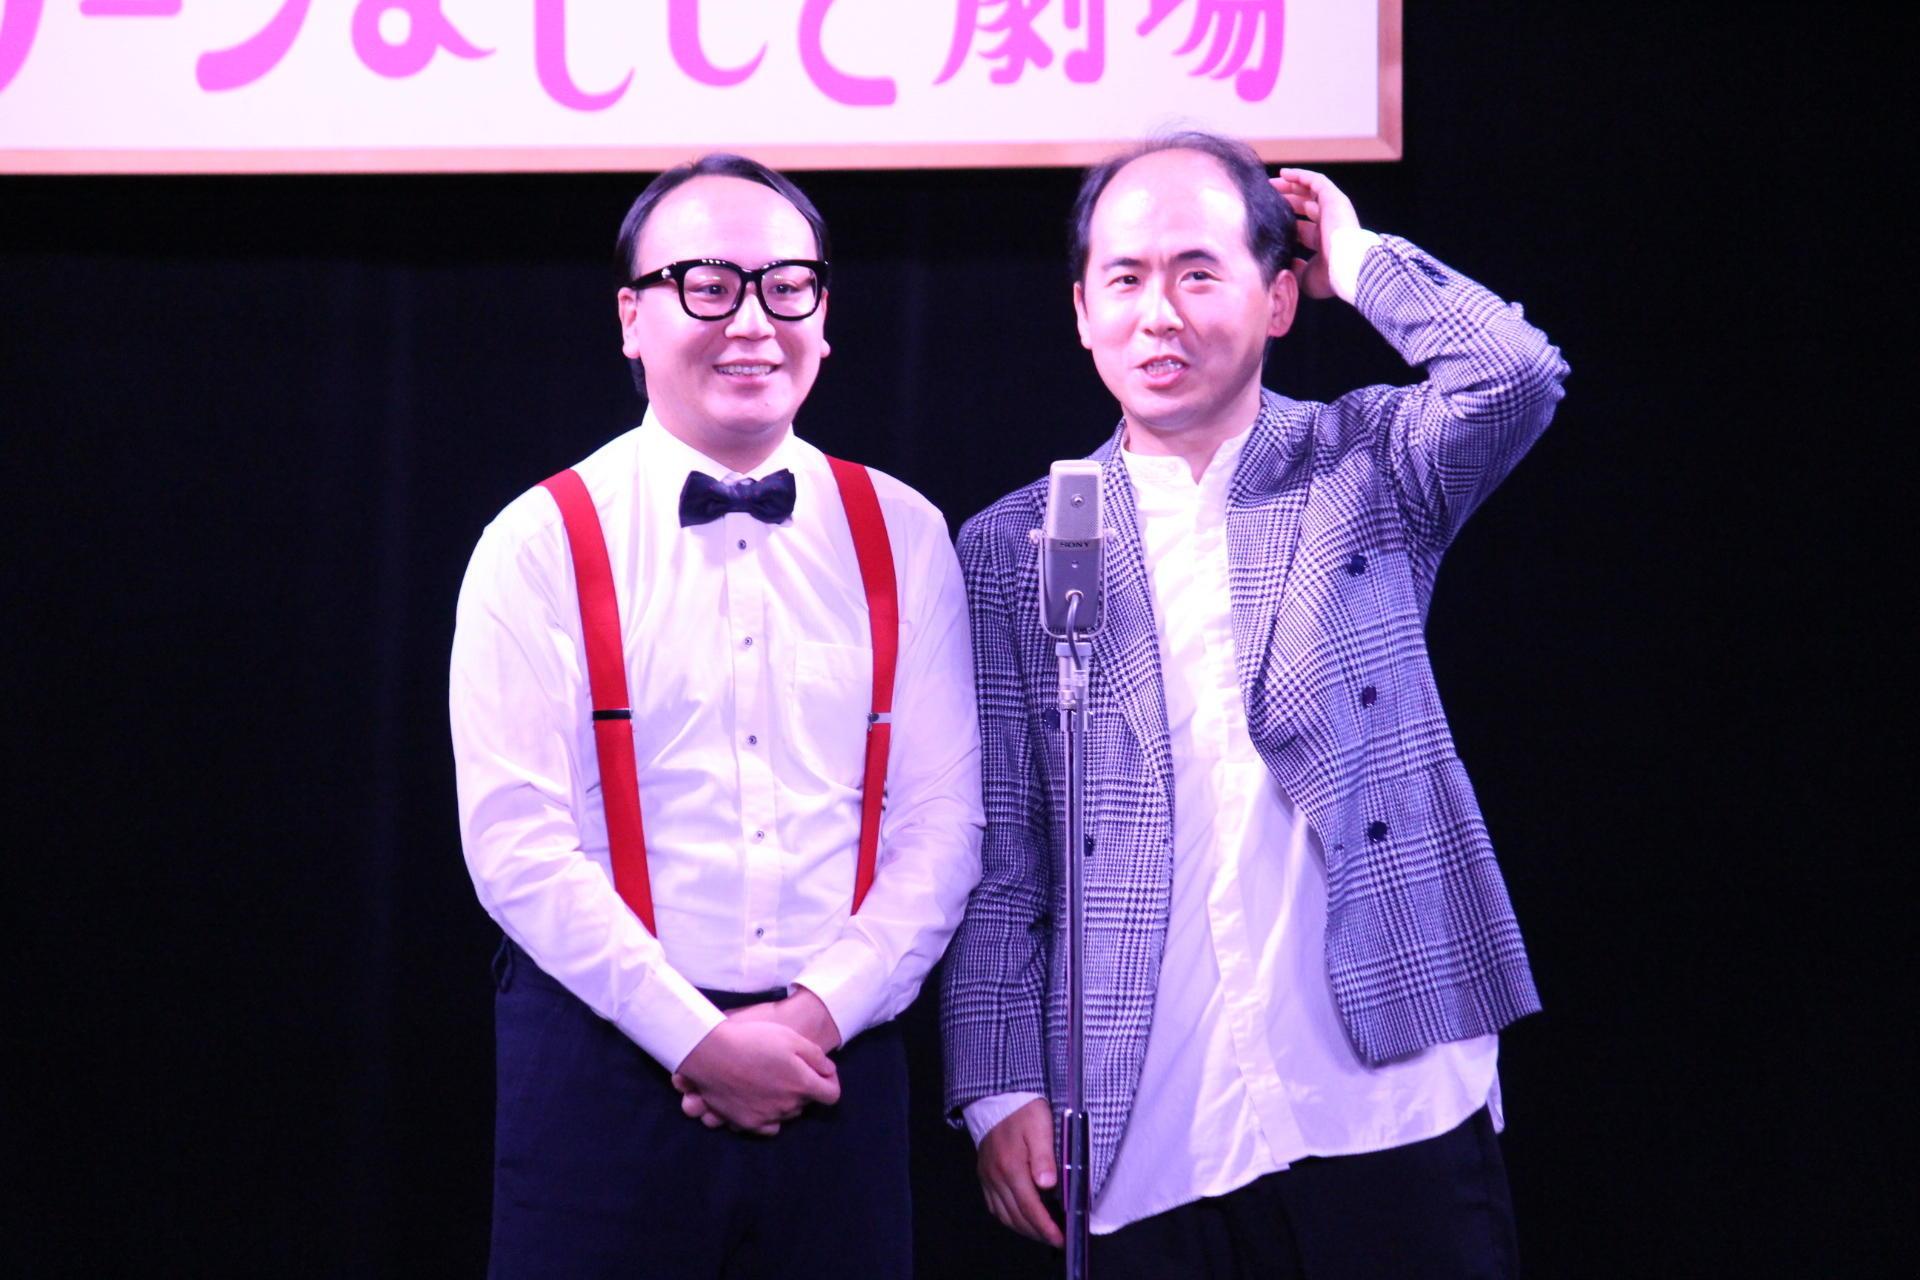 http://47web.jp/shizuoka/uploads/IMG_2277.JPG